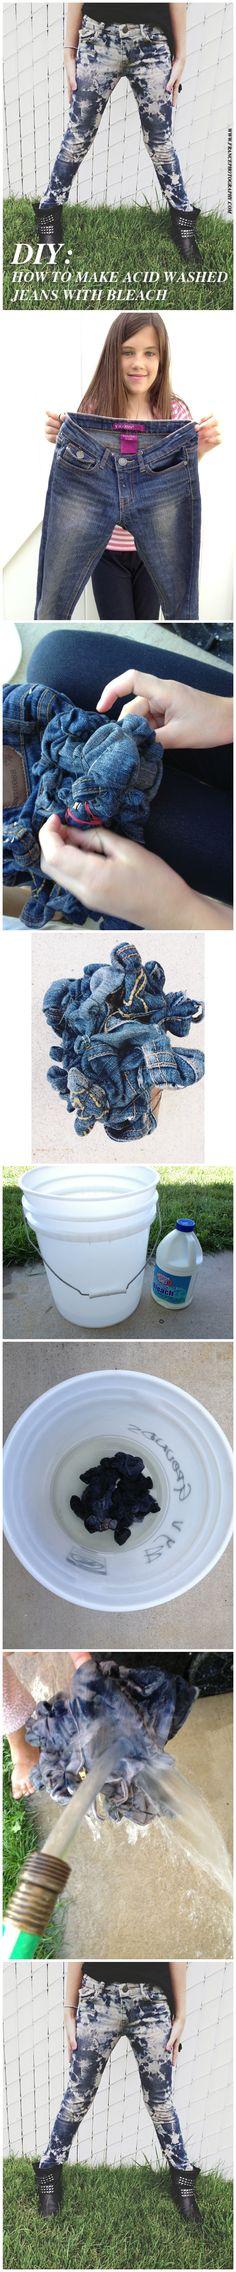 Chic Critique Forum | DIY - Make acid wash jeans in 5 simple steps